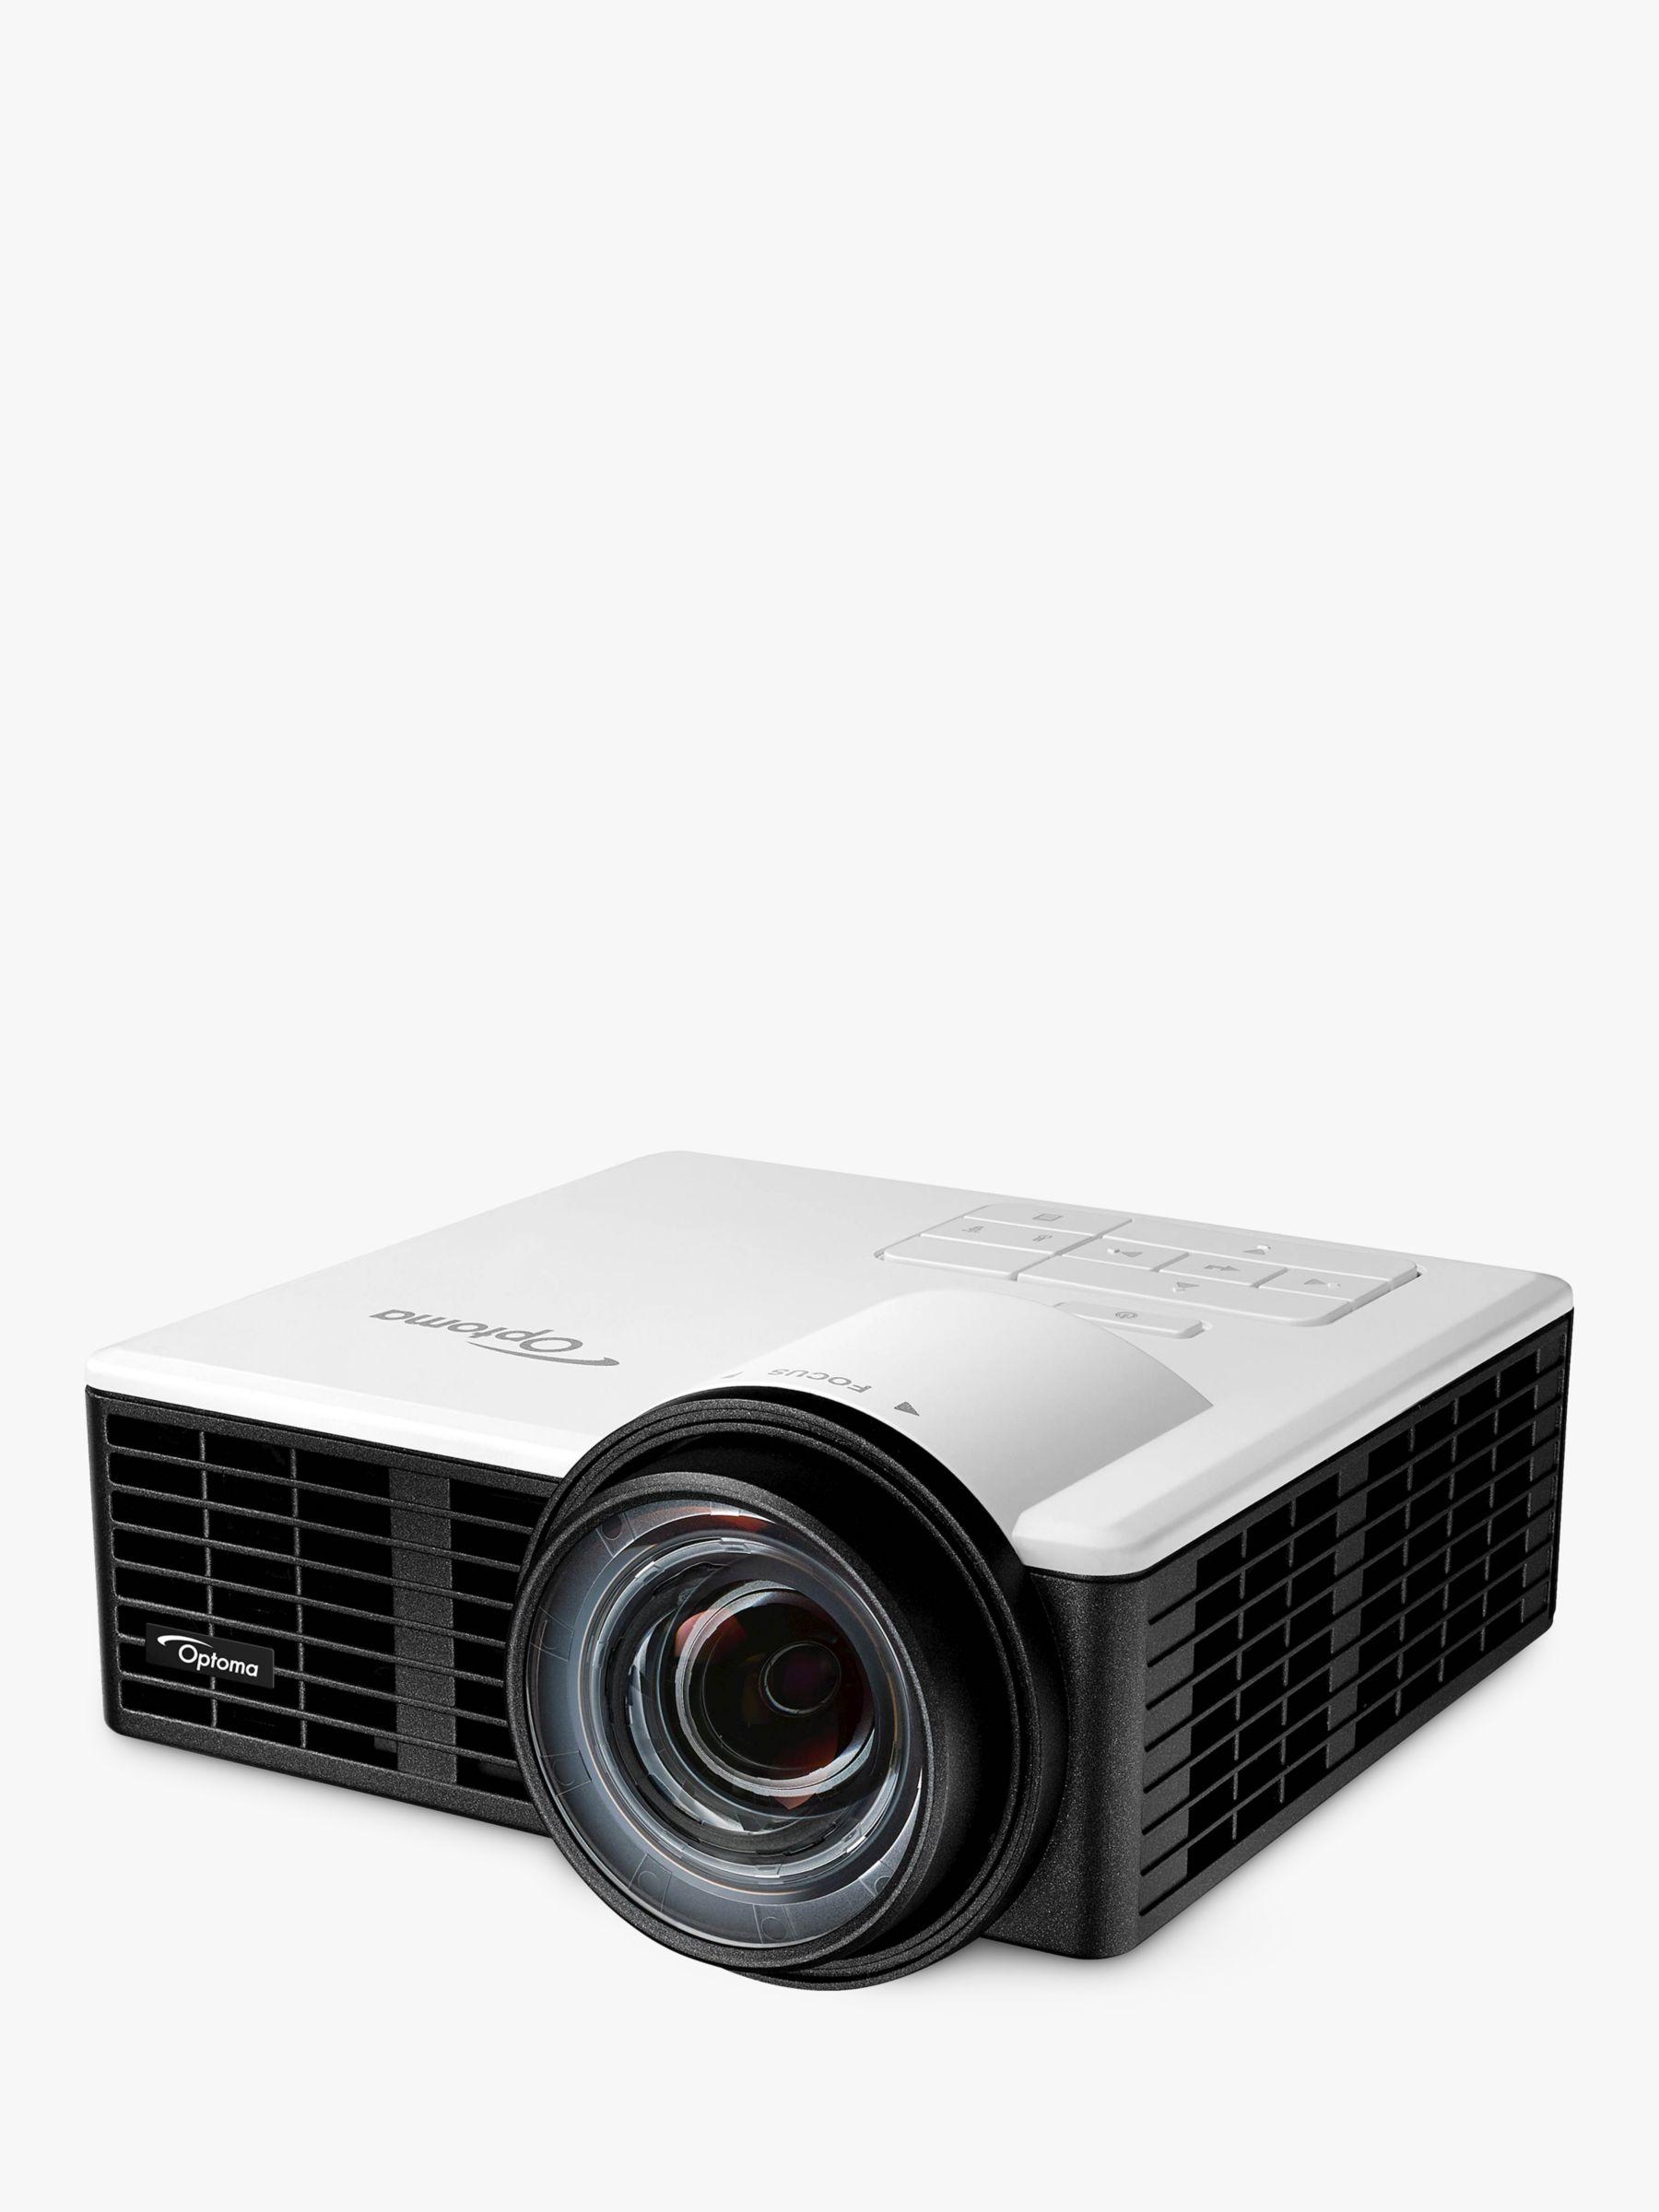 Optoma ML1050ST HD Ready 3D Portable Projector, 1000 Lumens